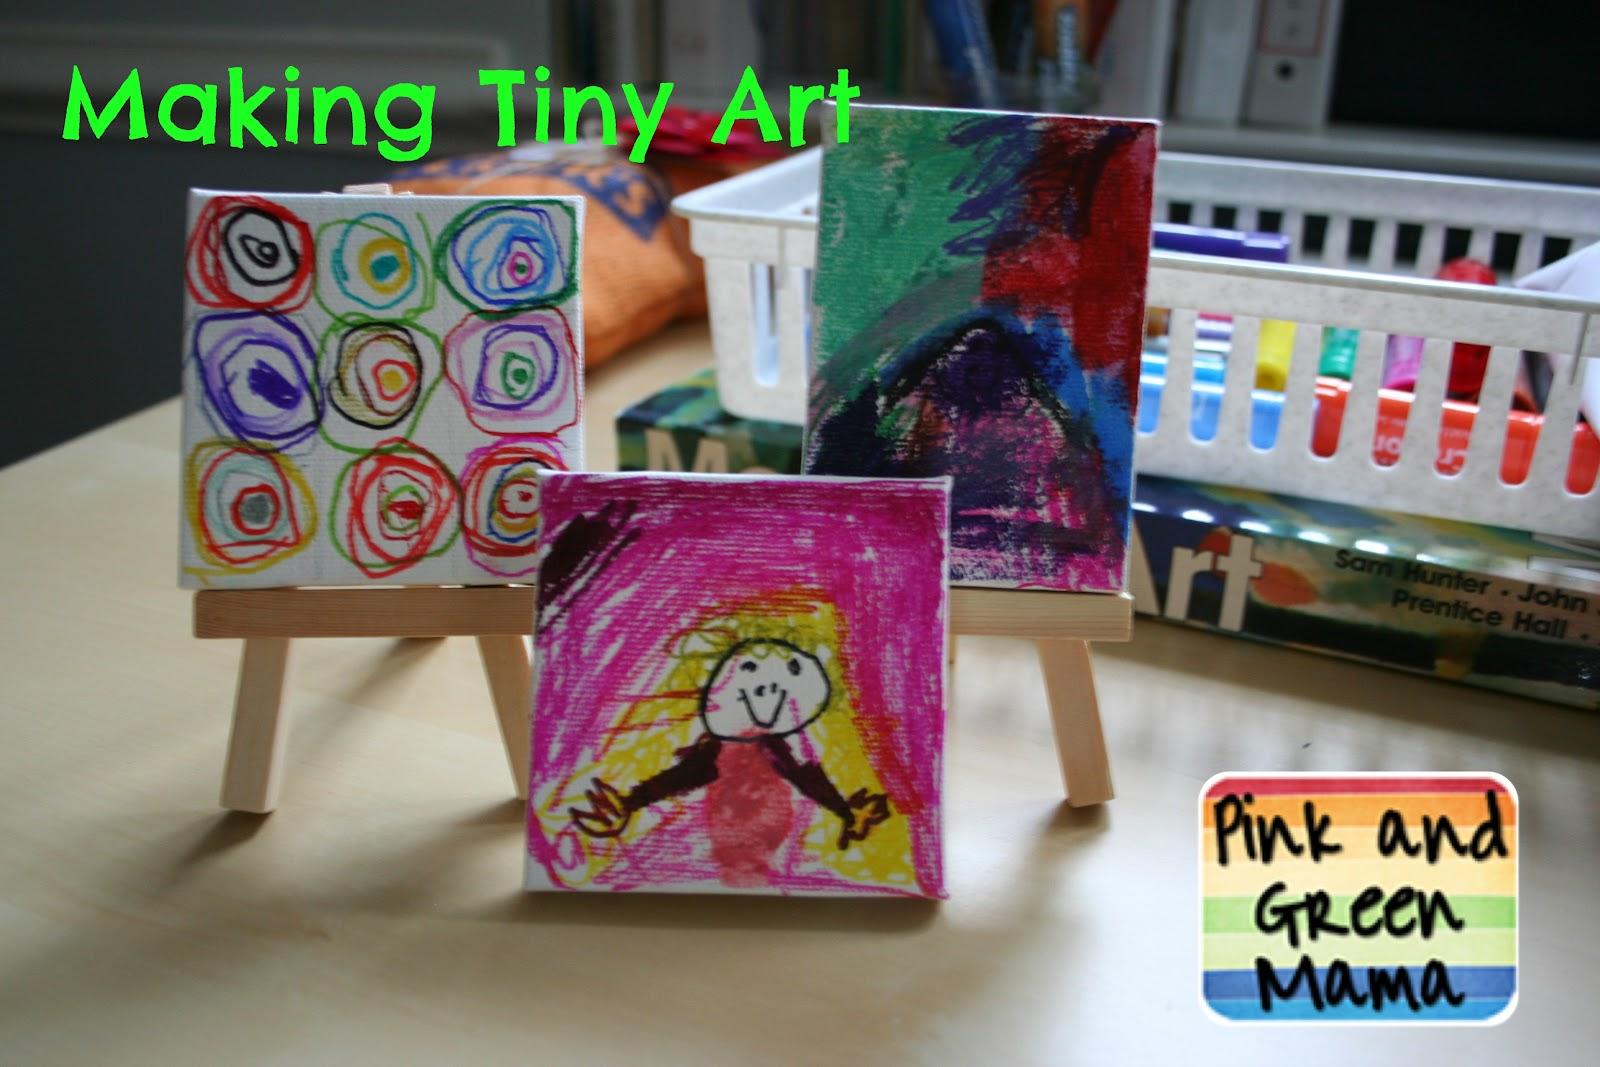 Tiny art images 94